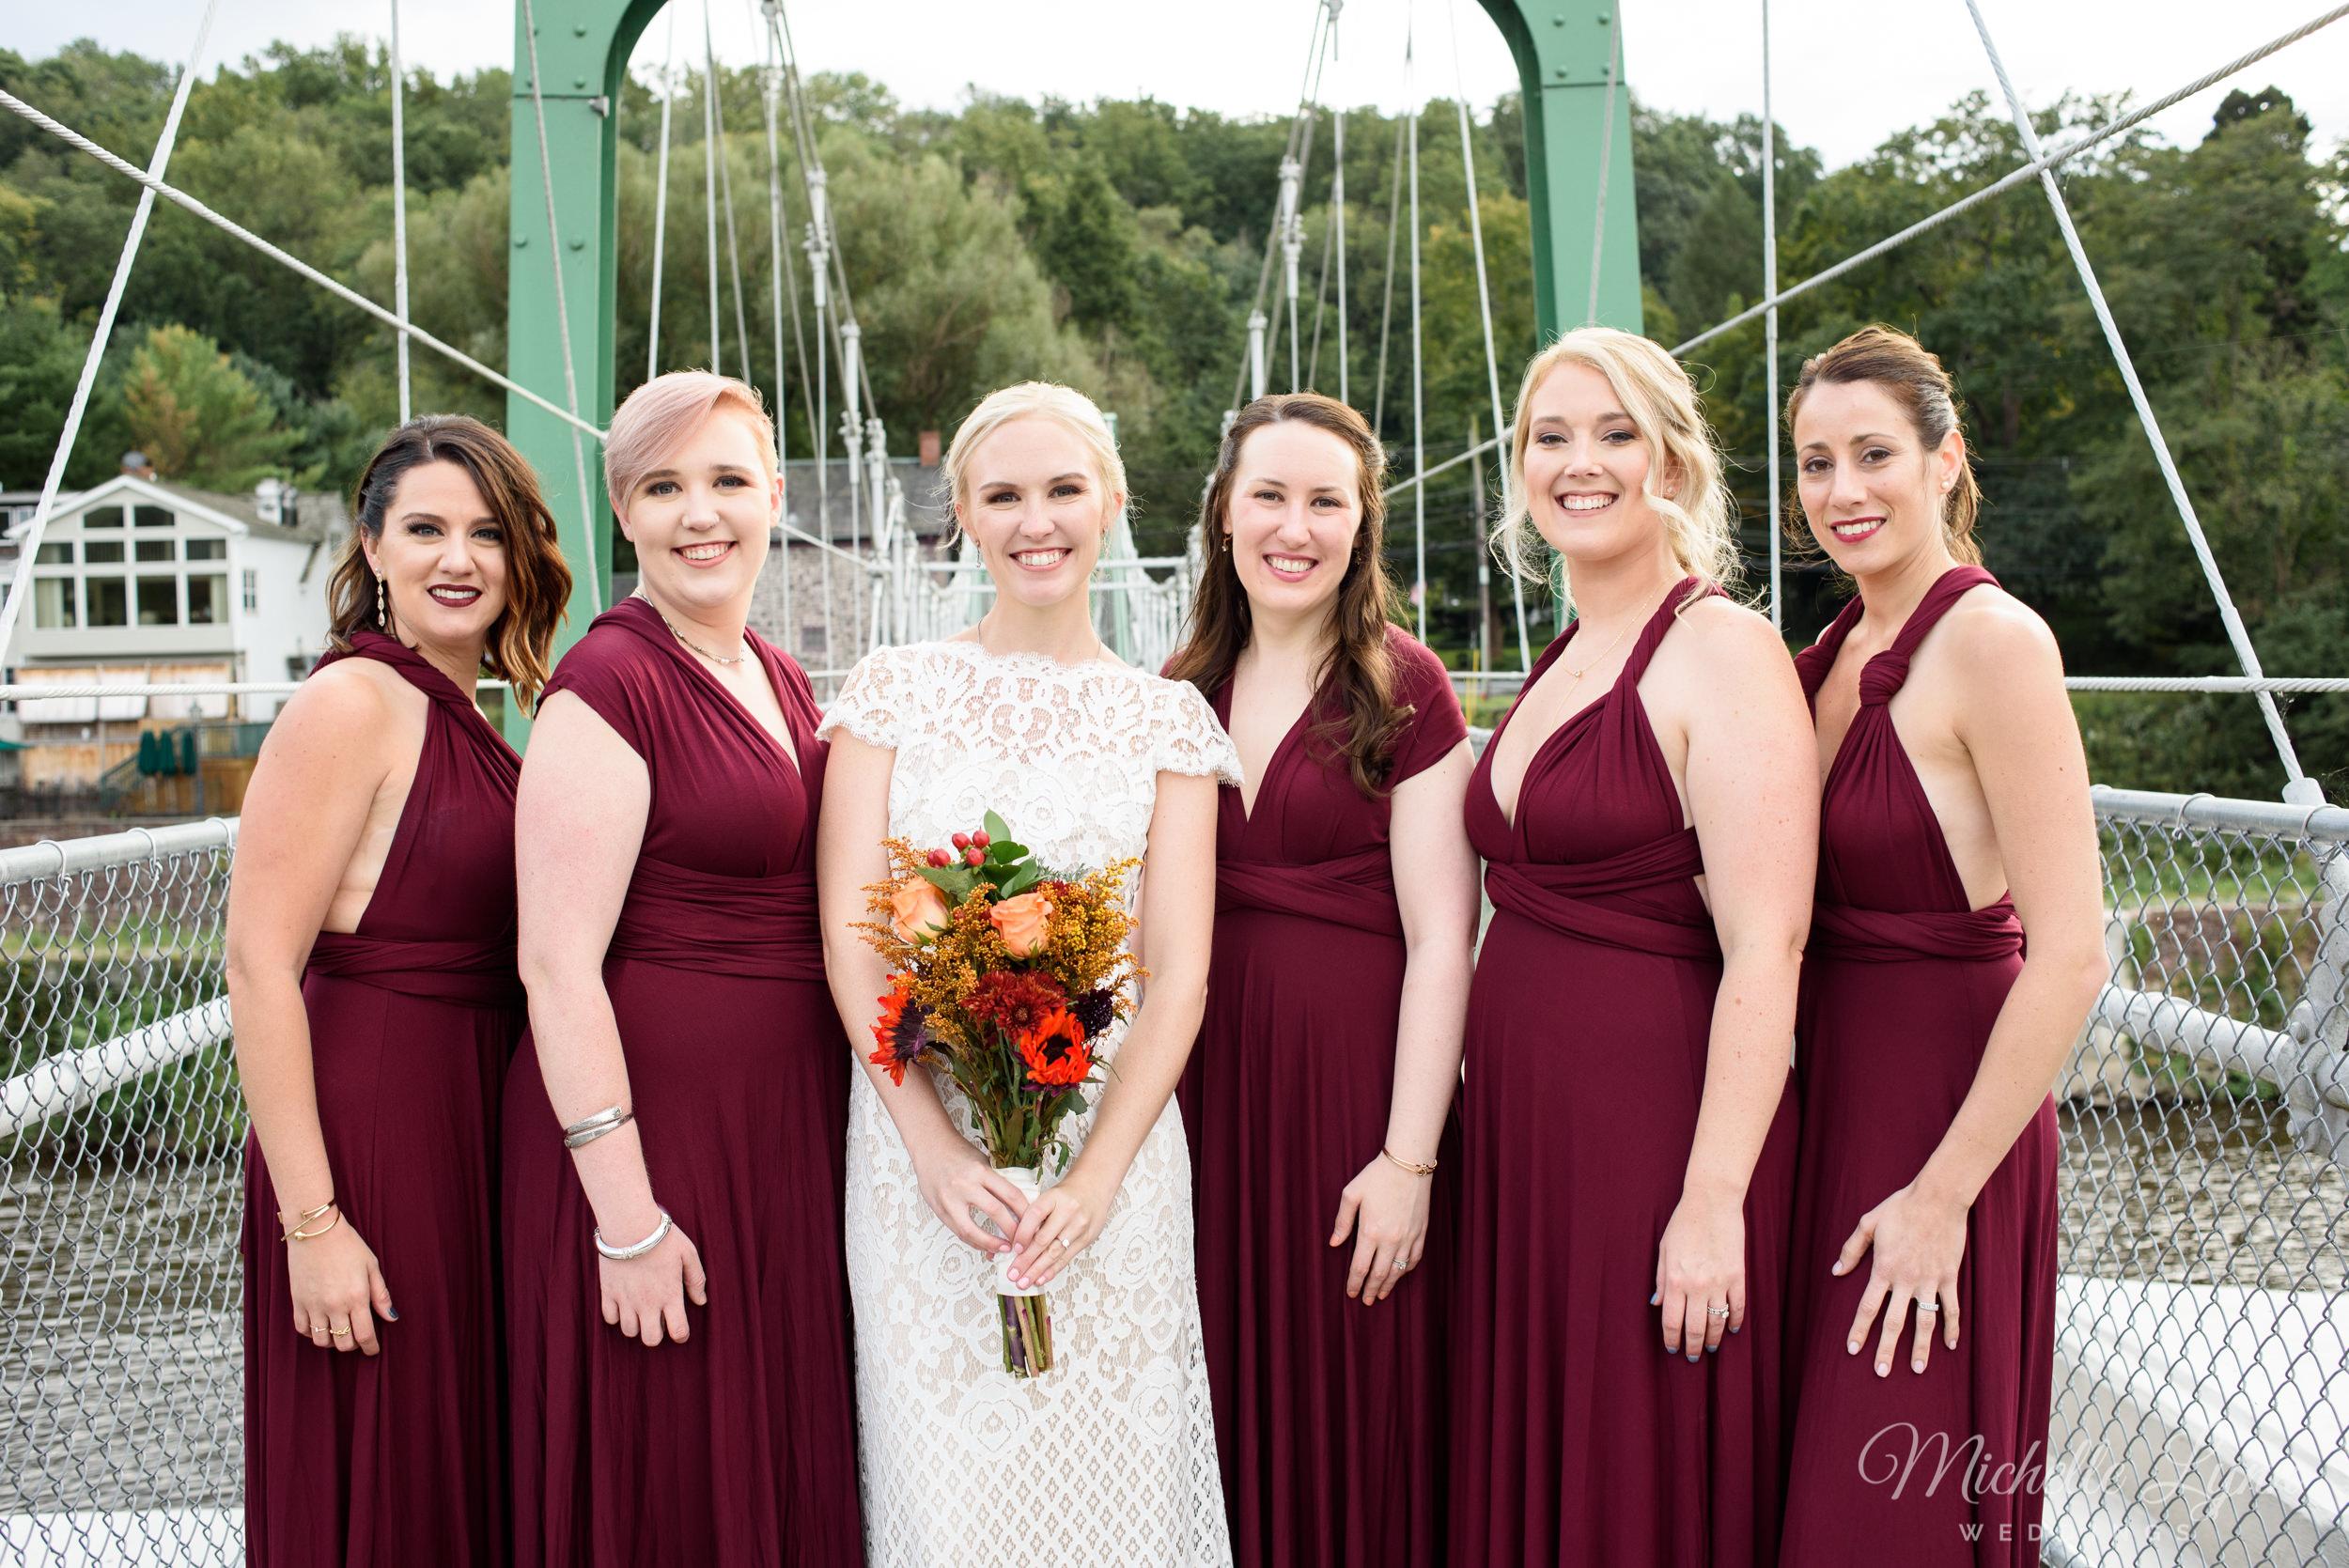 mlw-lumberville-general-store-new-hope-wedding-photographer-19.jpg